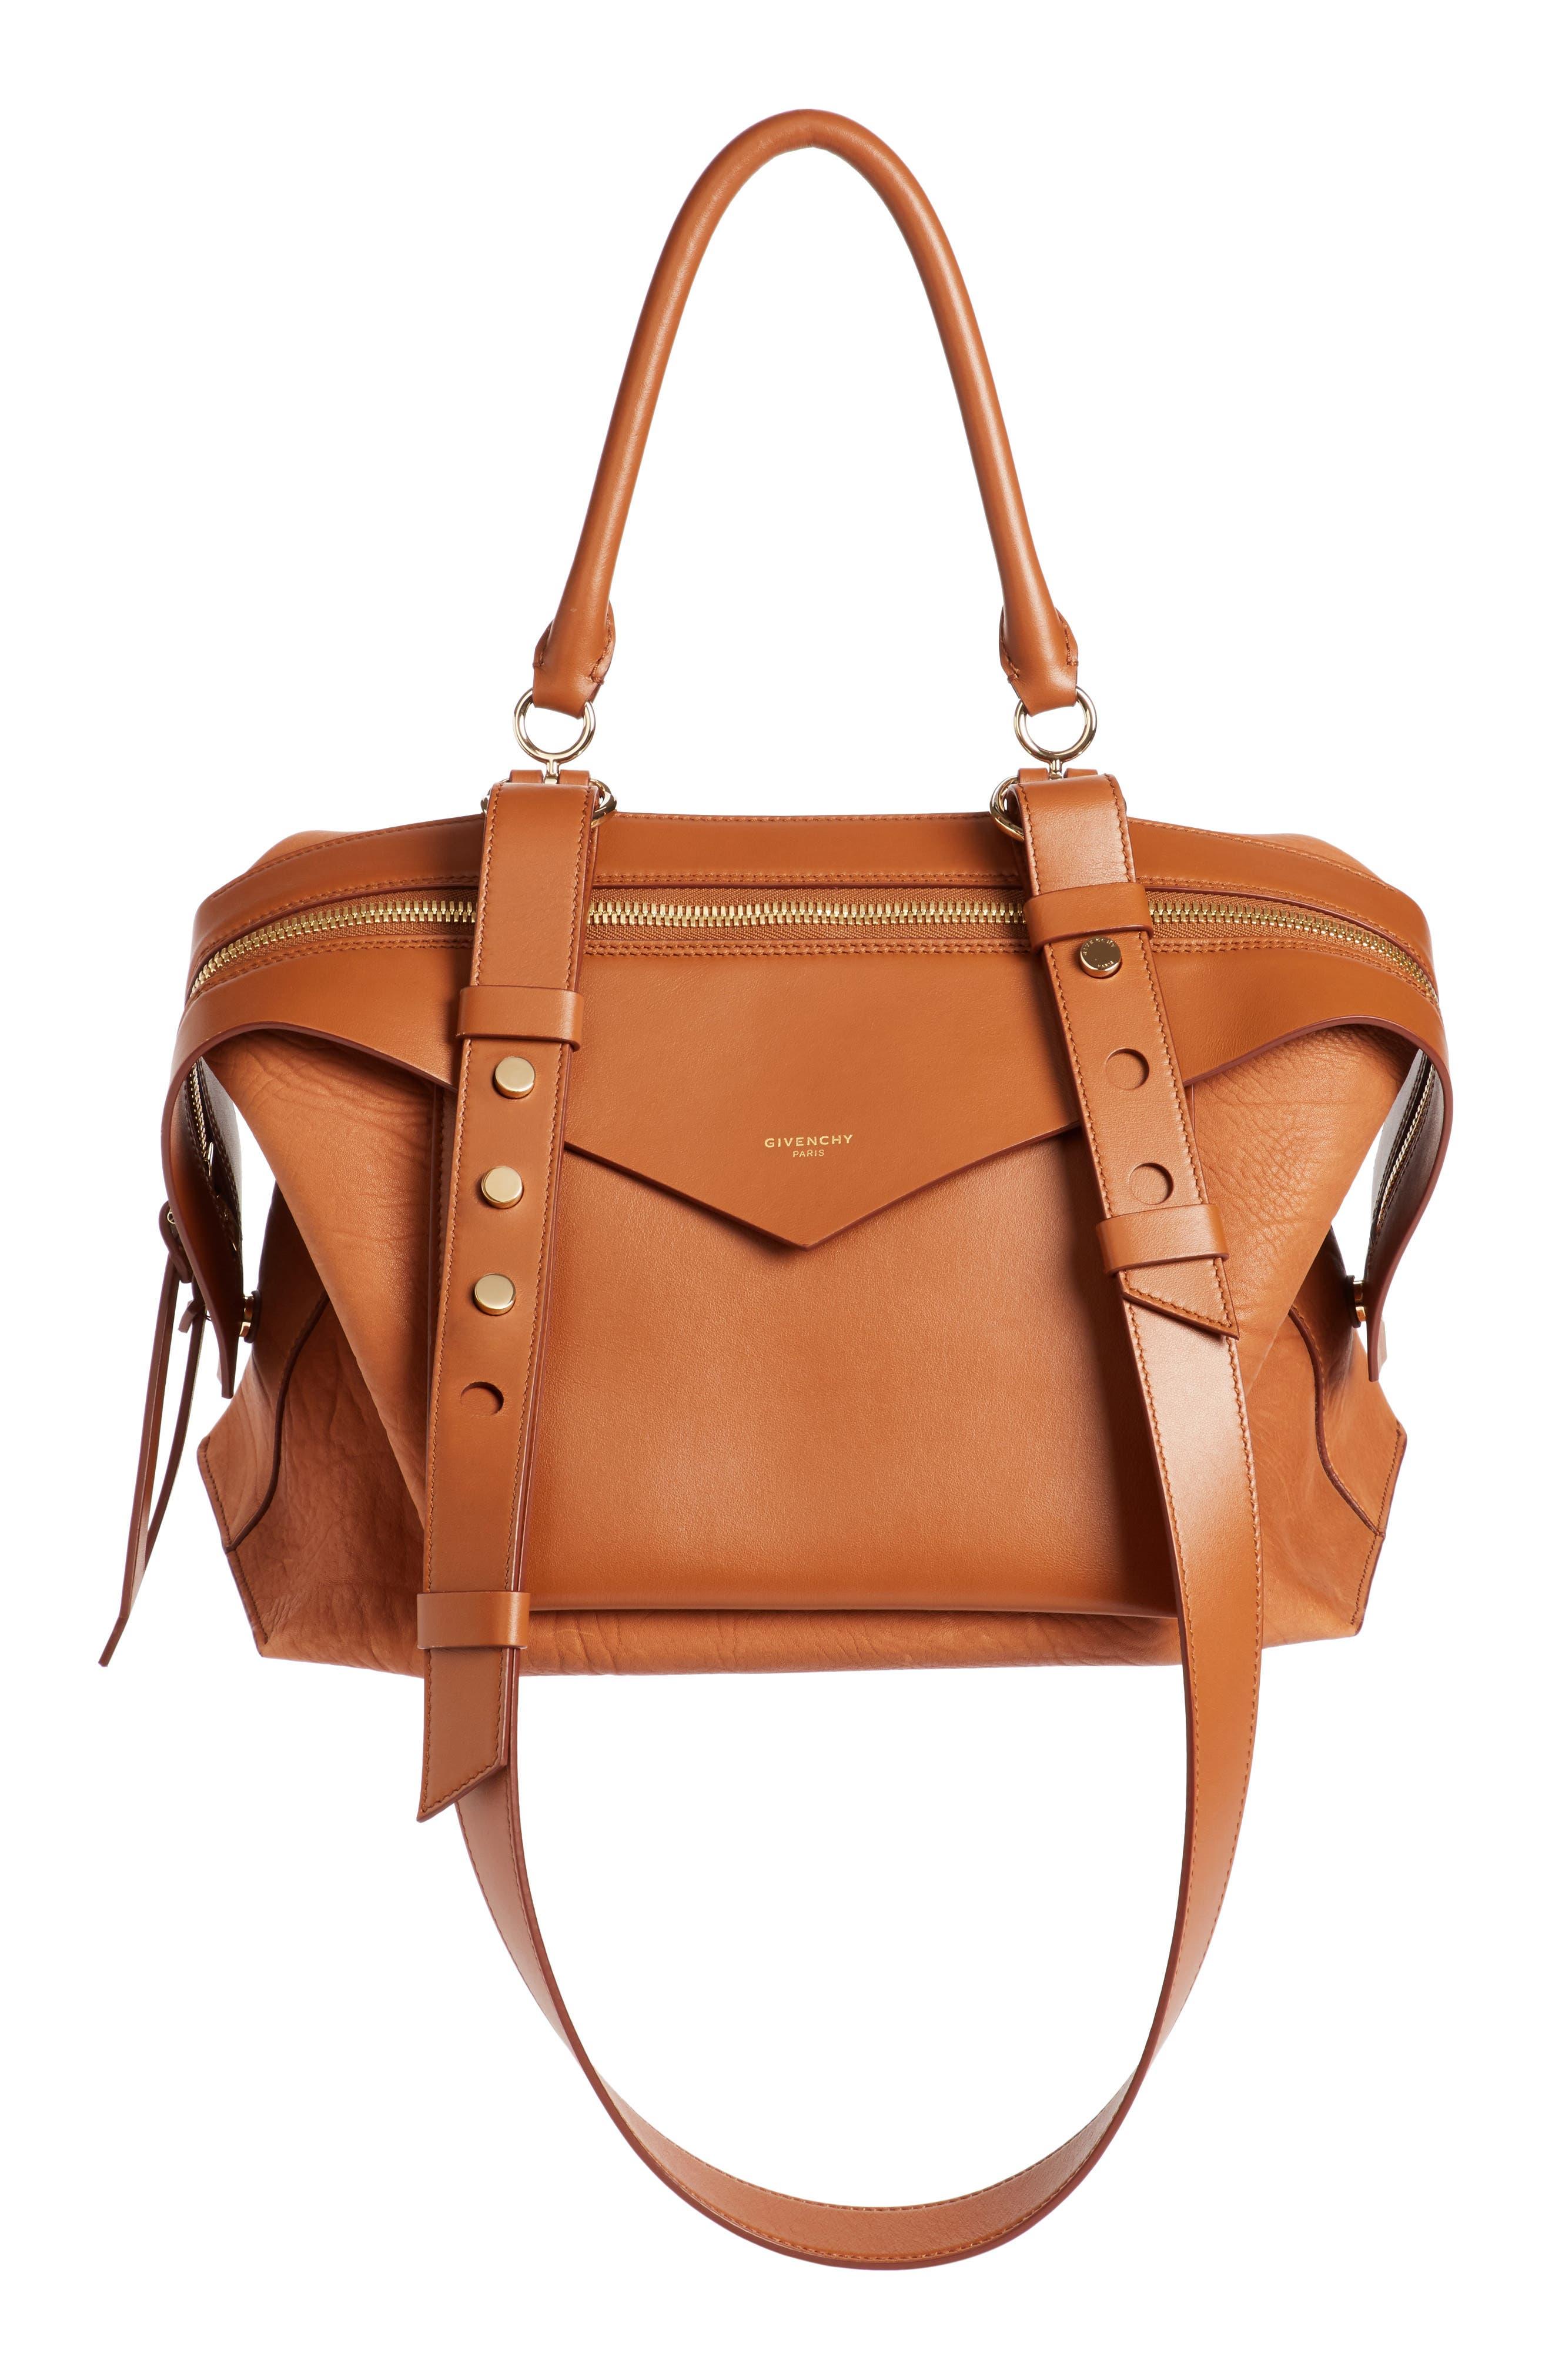 Alternate Image 1 Selected - Givenchy Medium Sway Leather Satchel